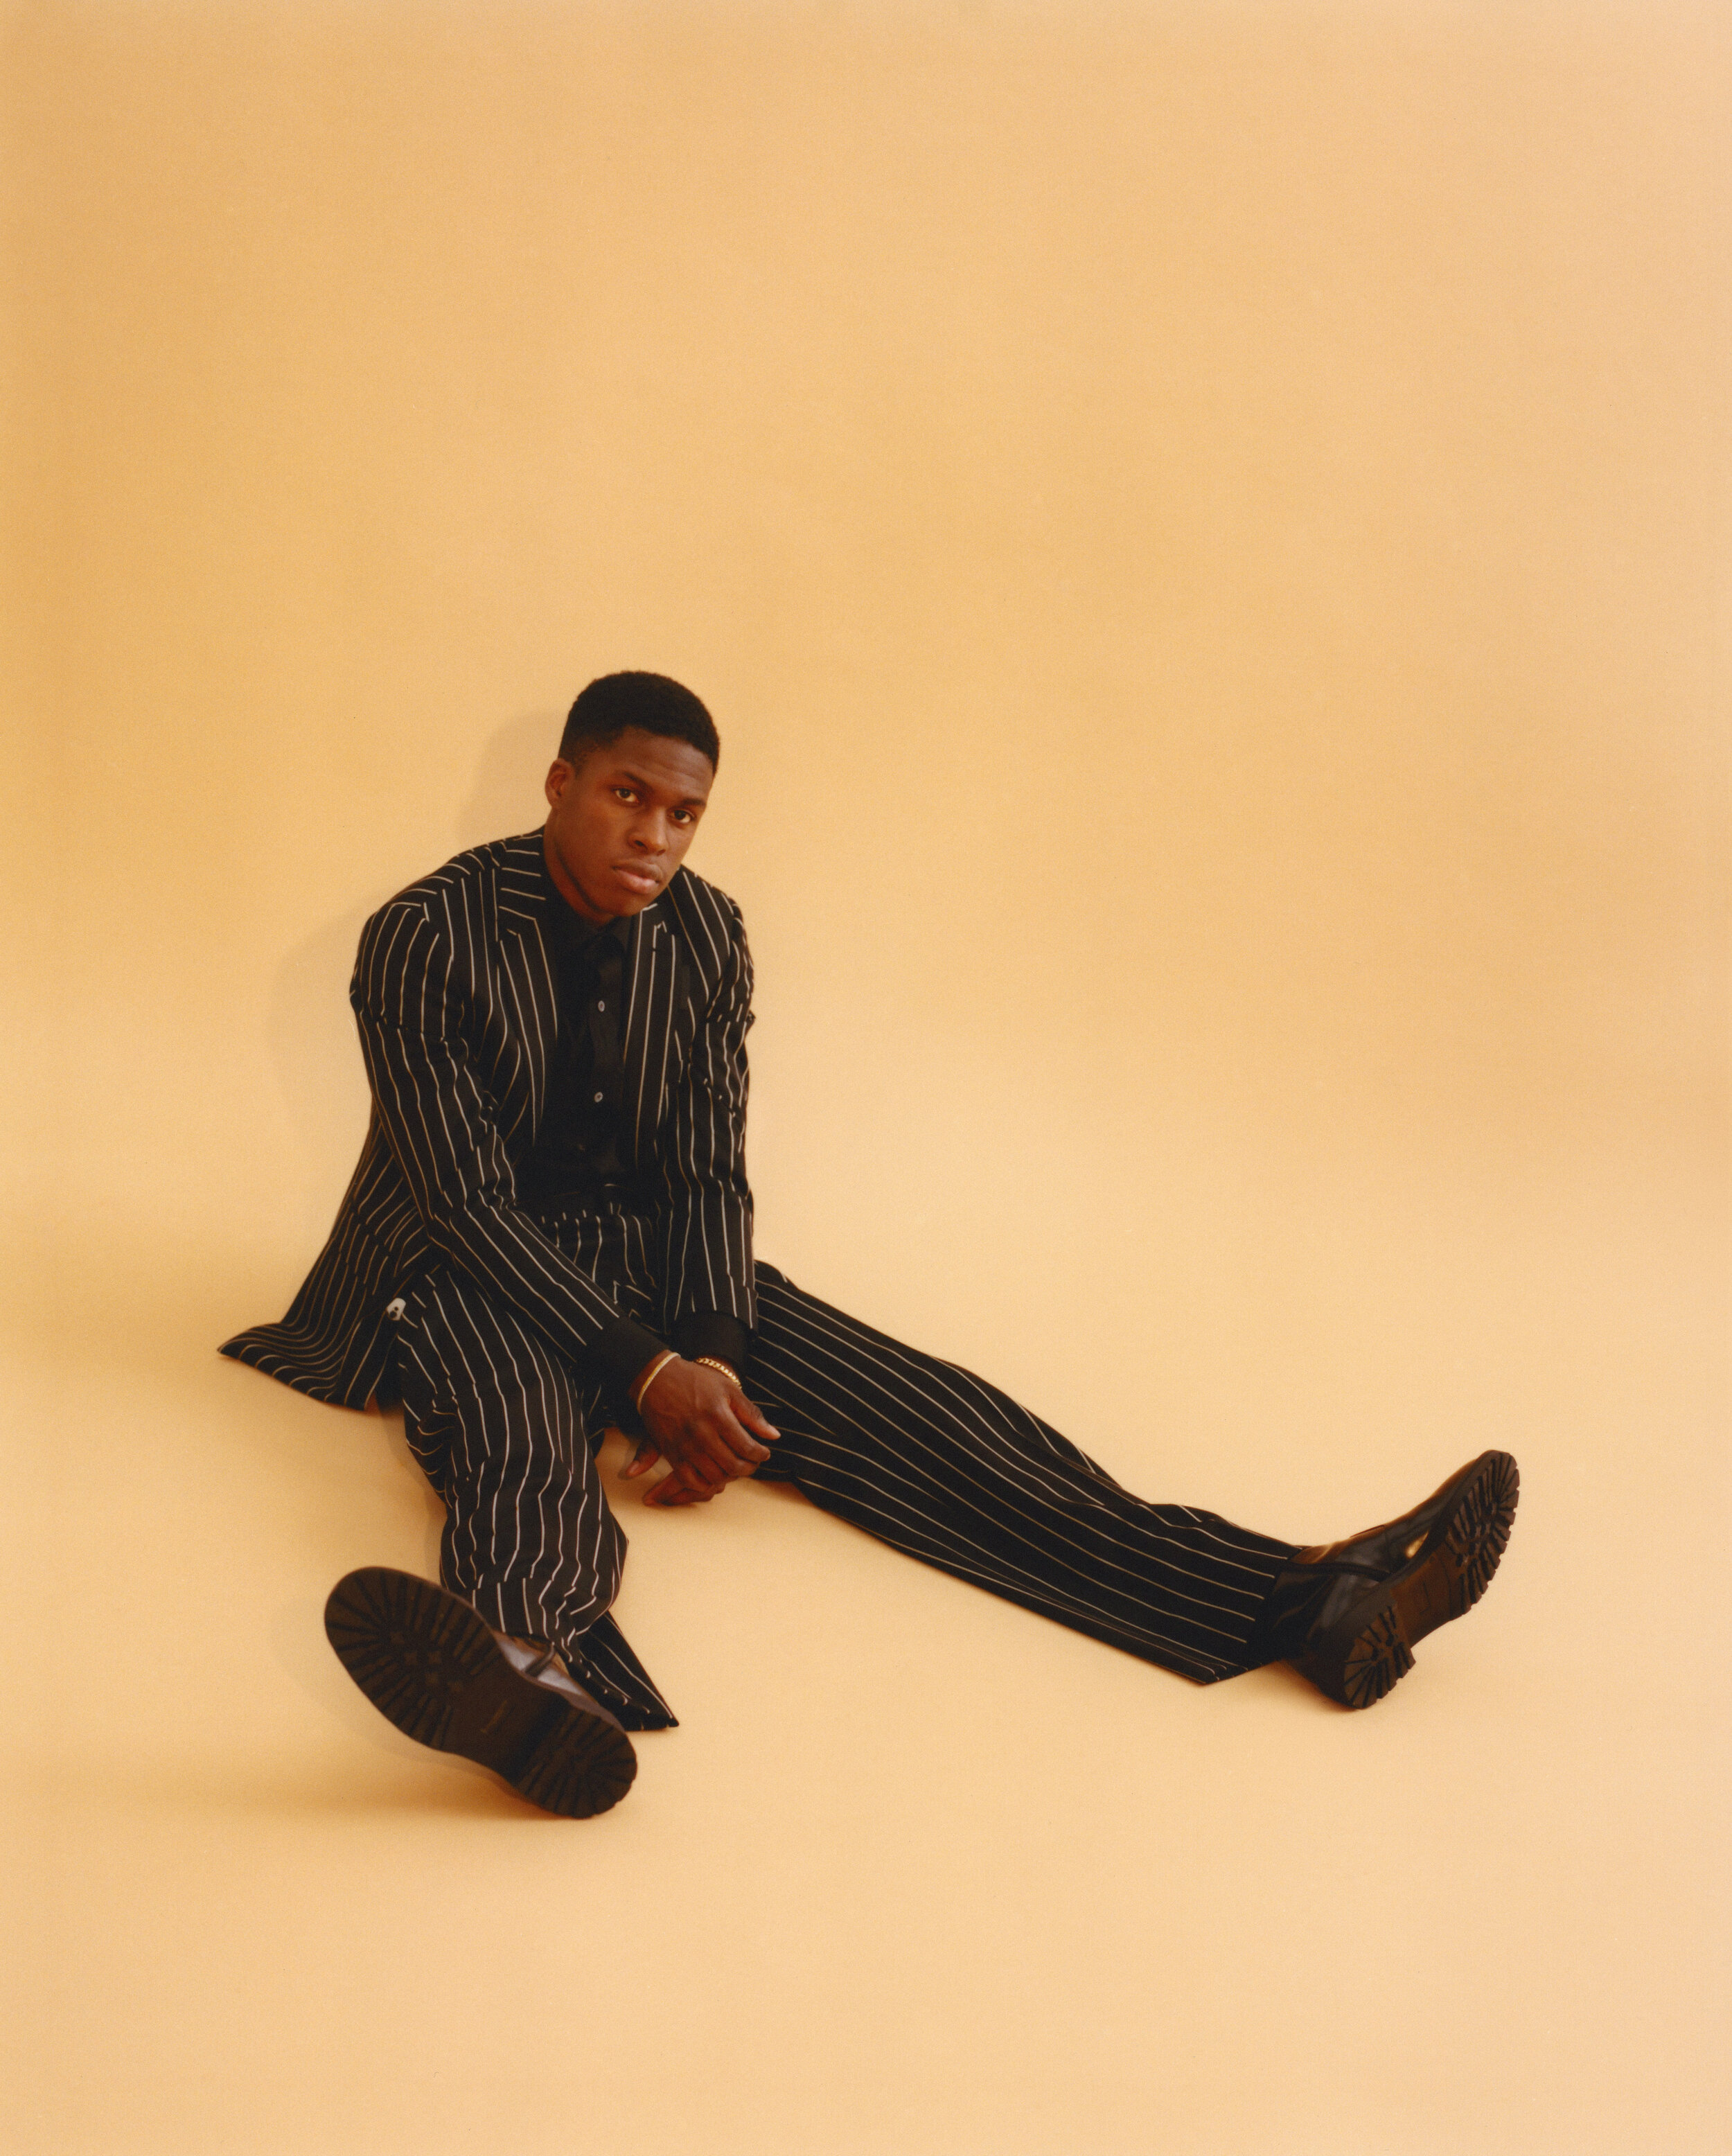 Suit  BURBERRY    Shirt  TOM FORD    Shoes  DRIES VAN NOTEN